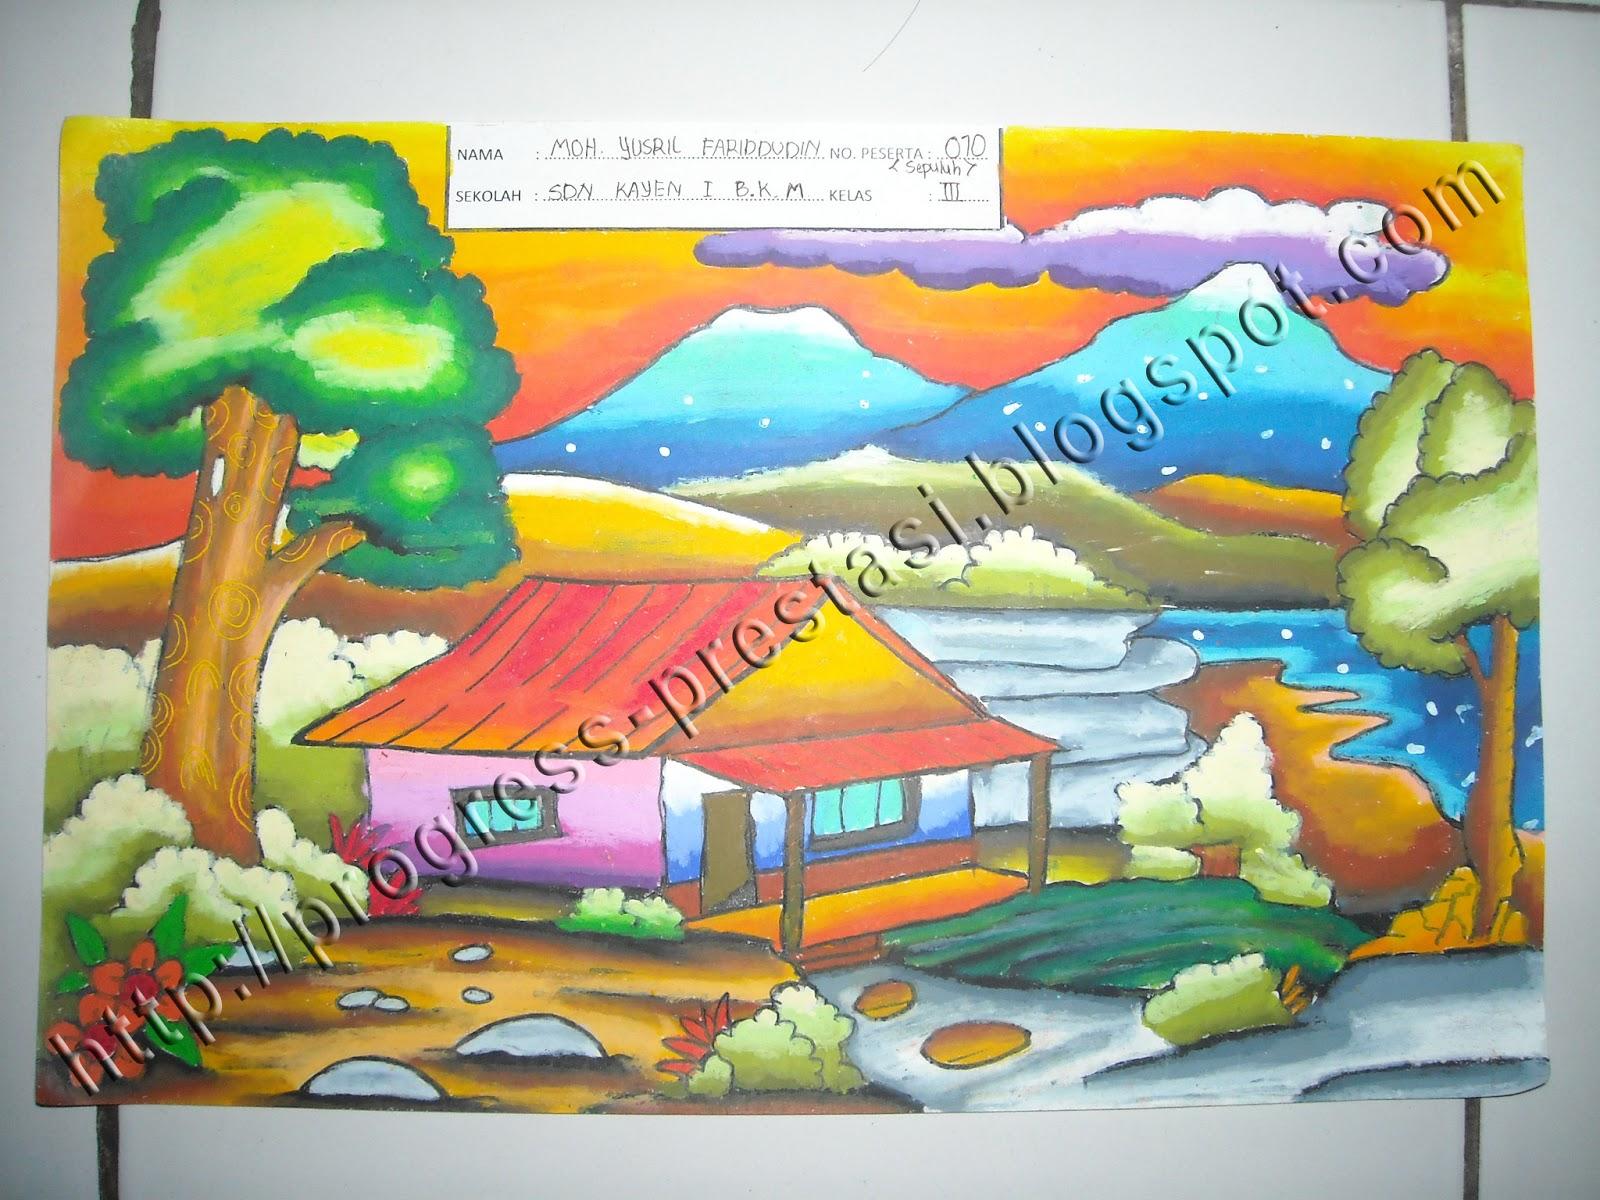 Gambar Rumah Anak Sd Kelas 6 Rumah Joglo Limasan Work